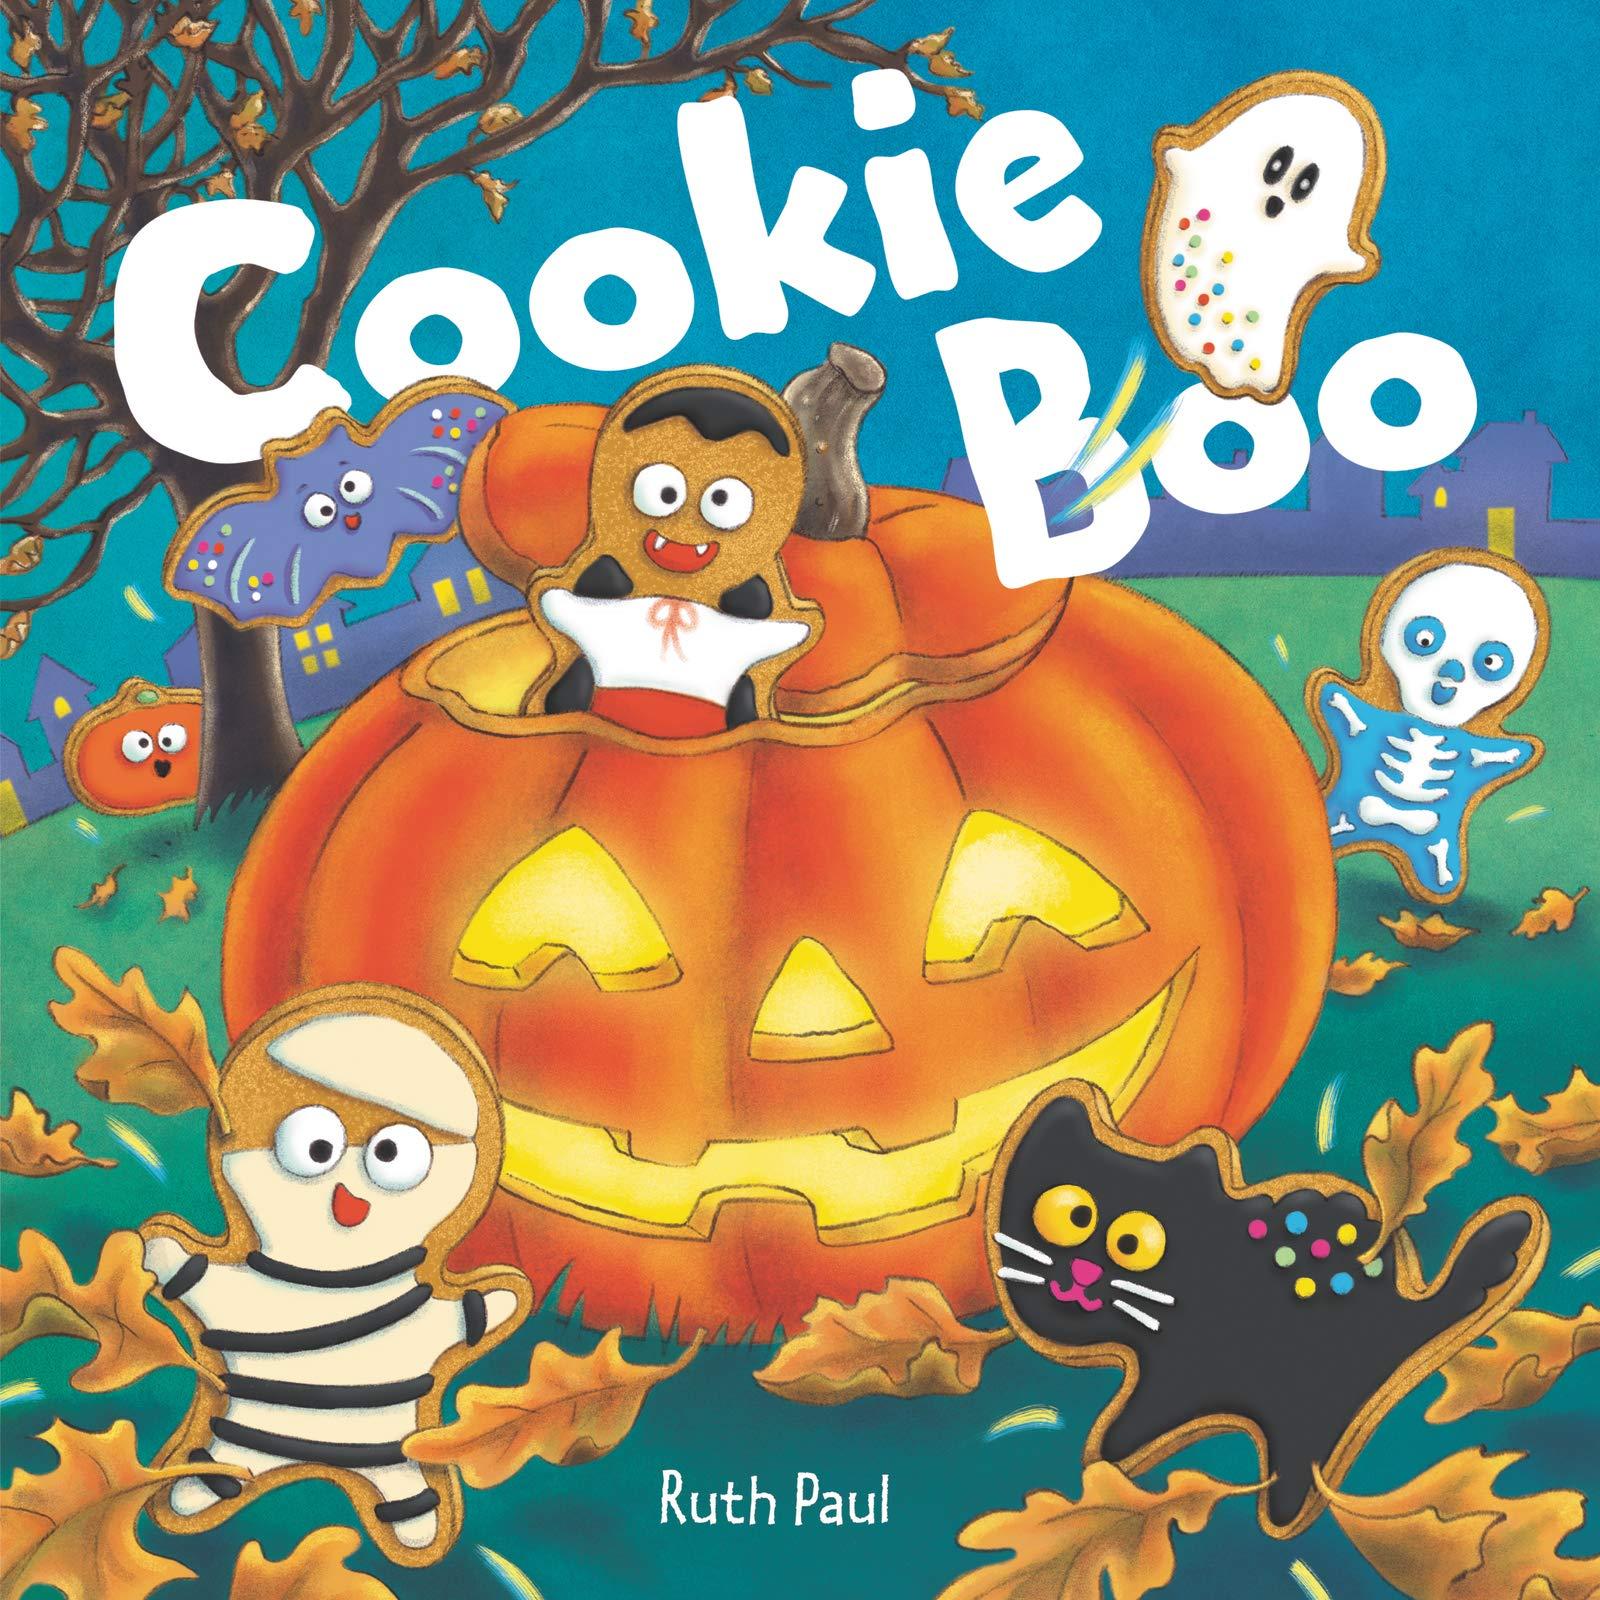 Amazon.com: Cookie Boo: 9780062869562: Paul, Ruth, Paul, Ruth: Books